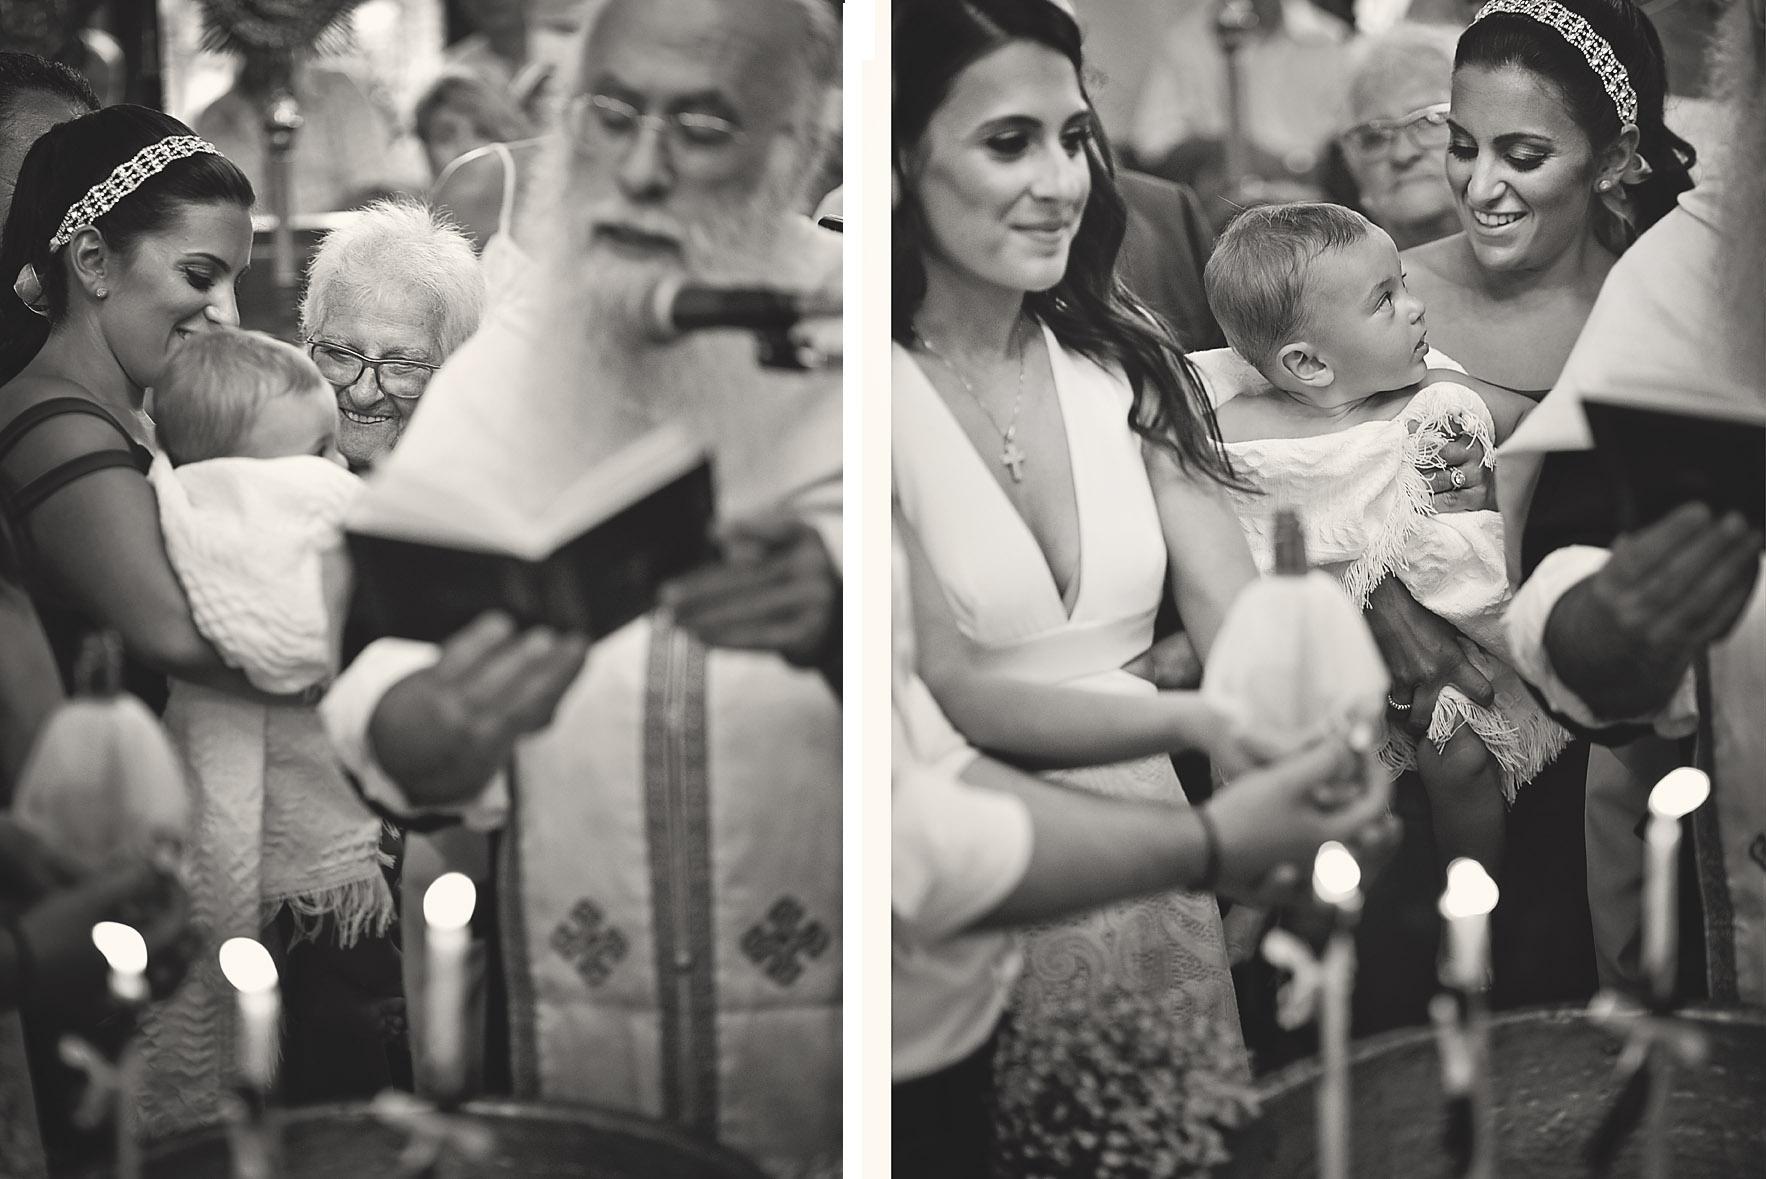 panagia-siriotissa-kampos-chios-christening-baptism-alexis-koumaditis-photography-16